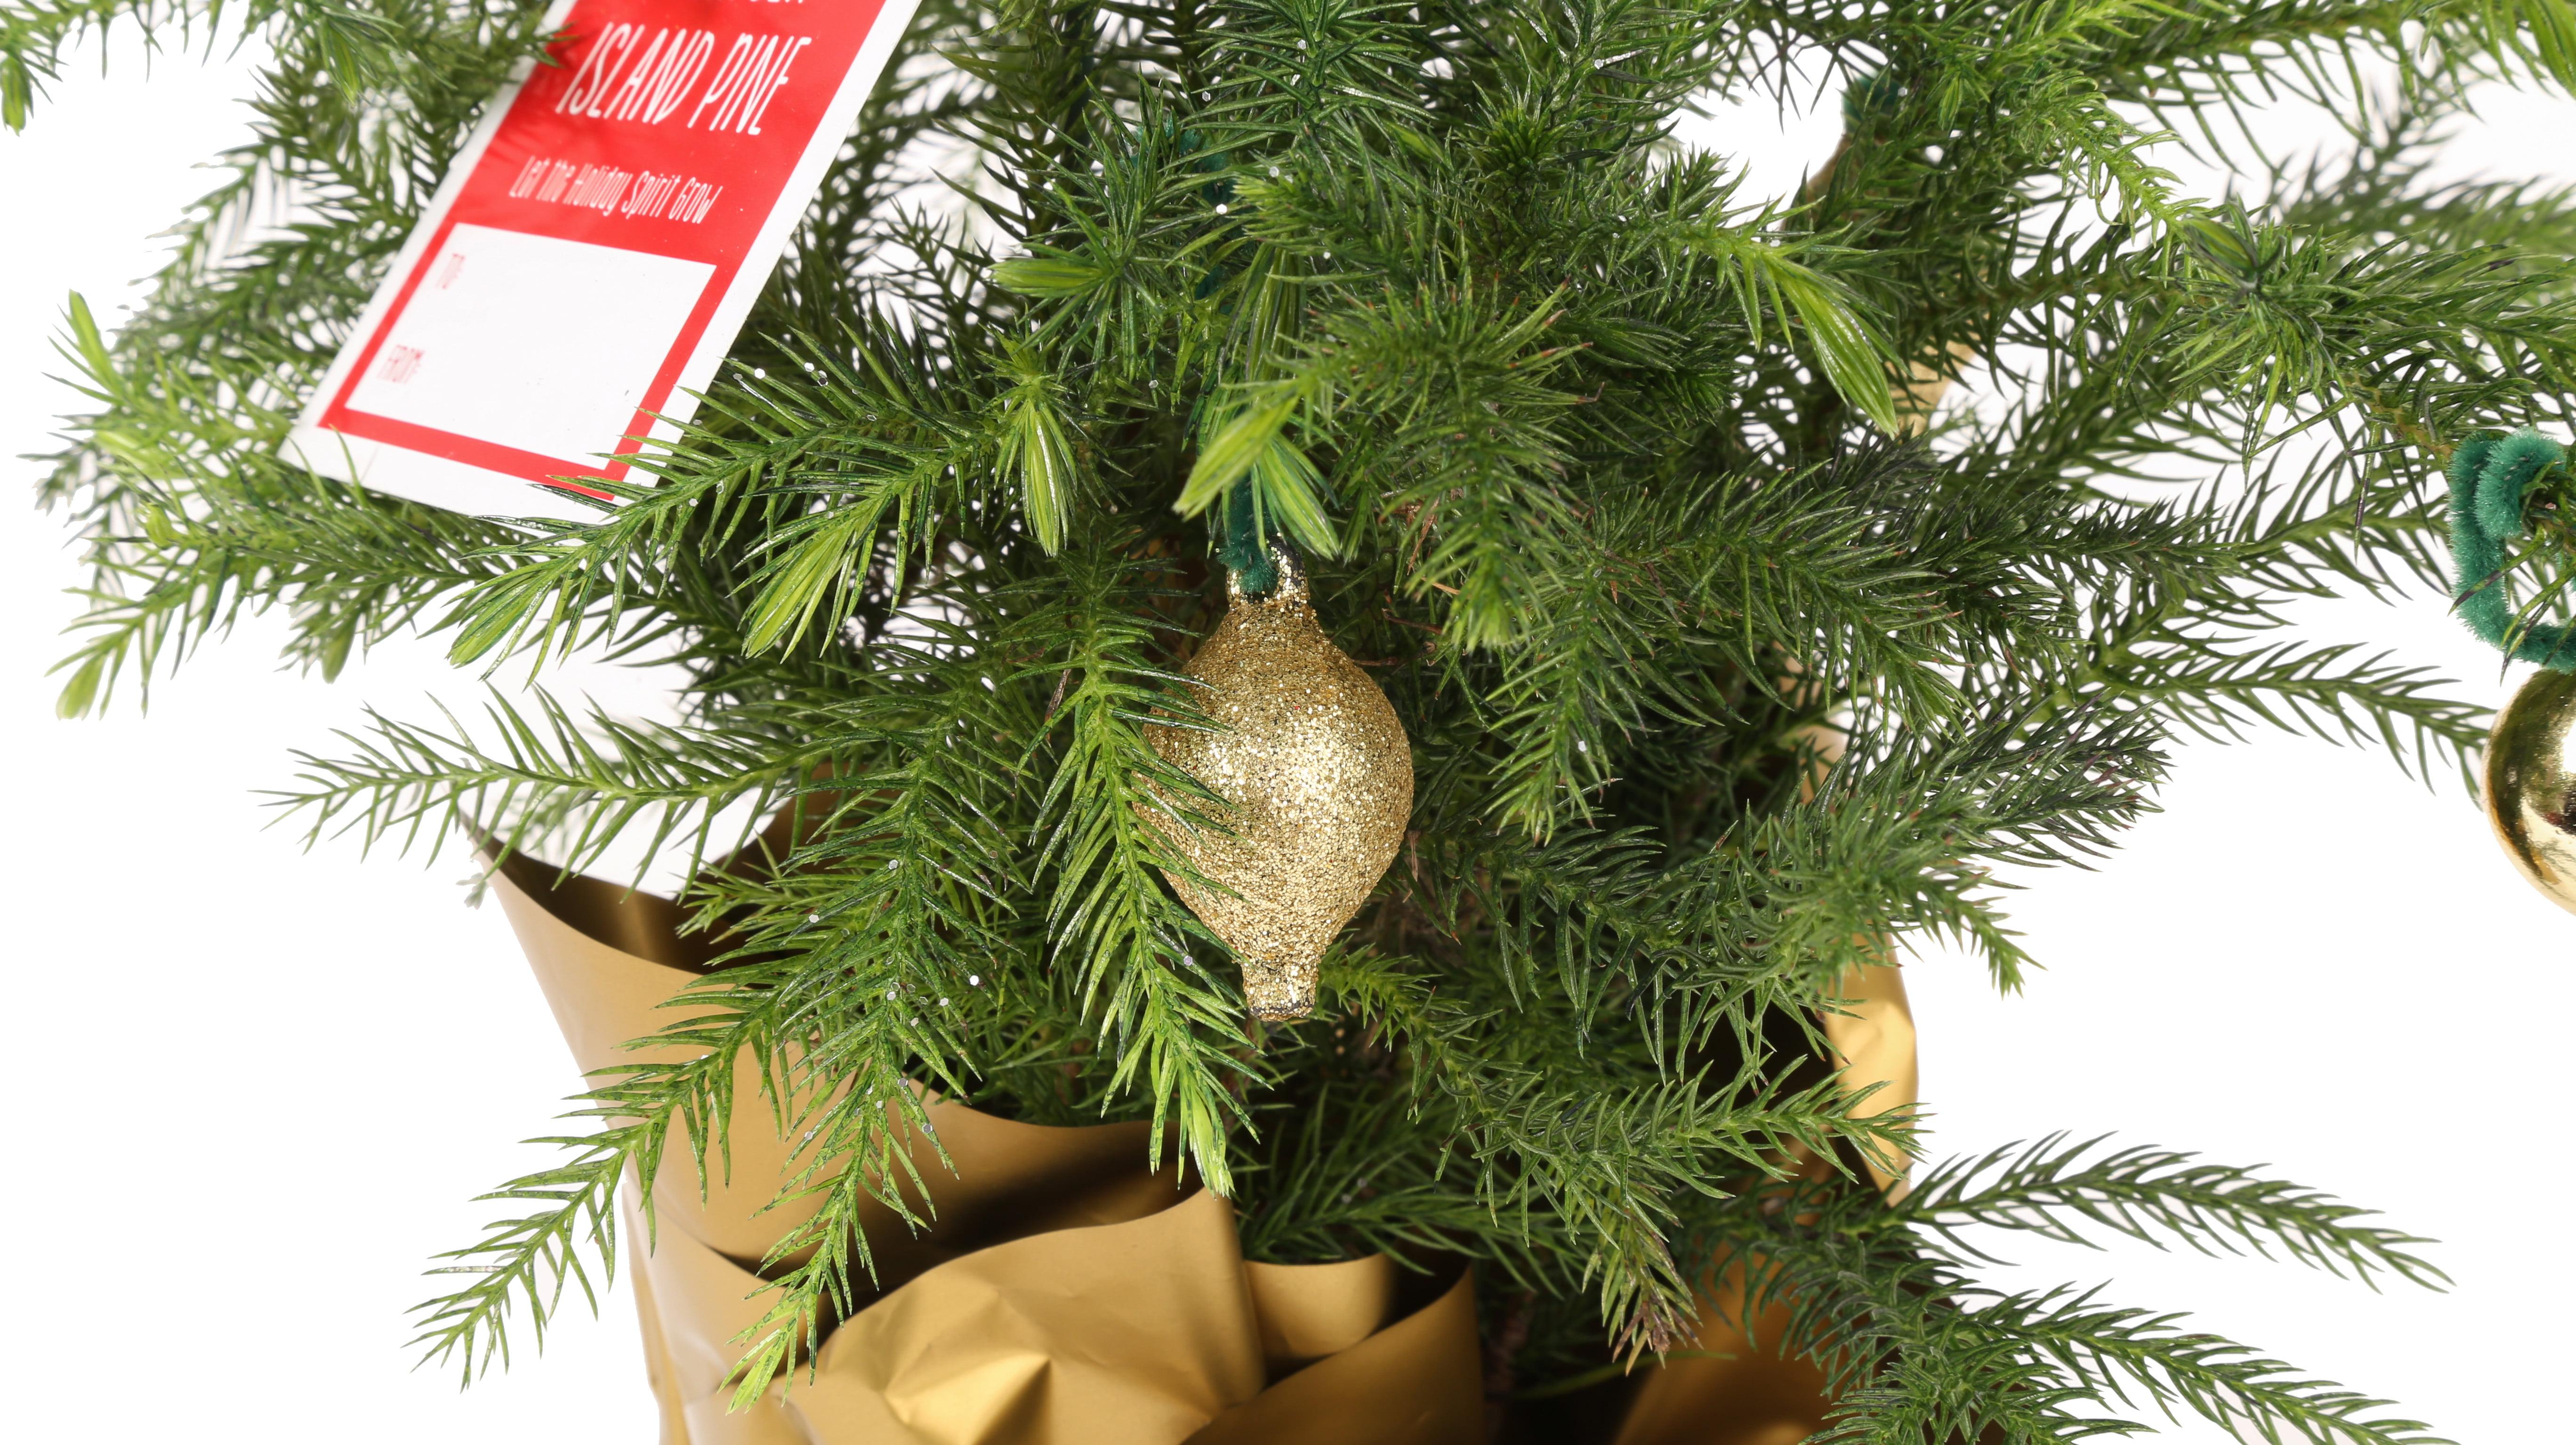 Delray Plants Live Norfolk Island Pine (Mini Christmas Tree), 4 pack ...